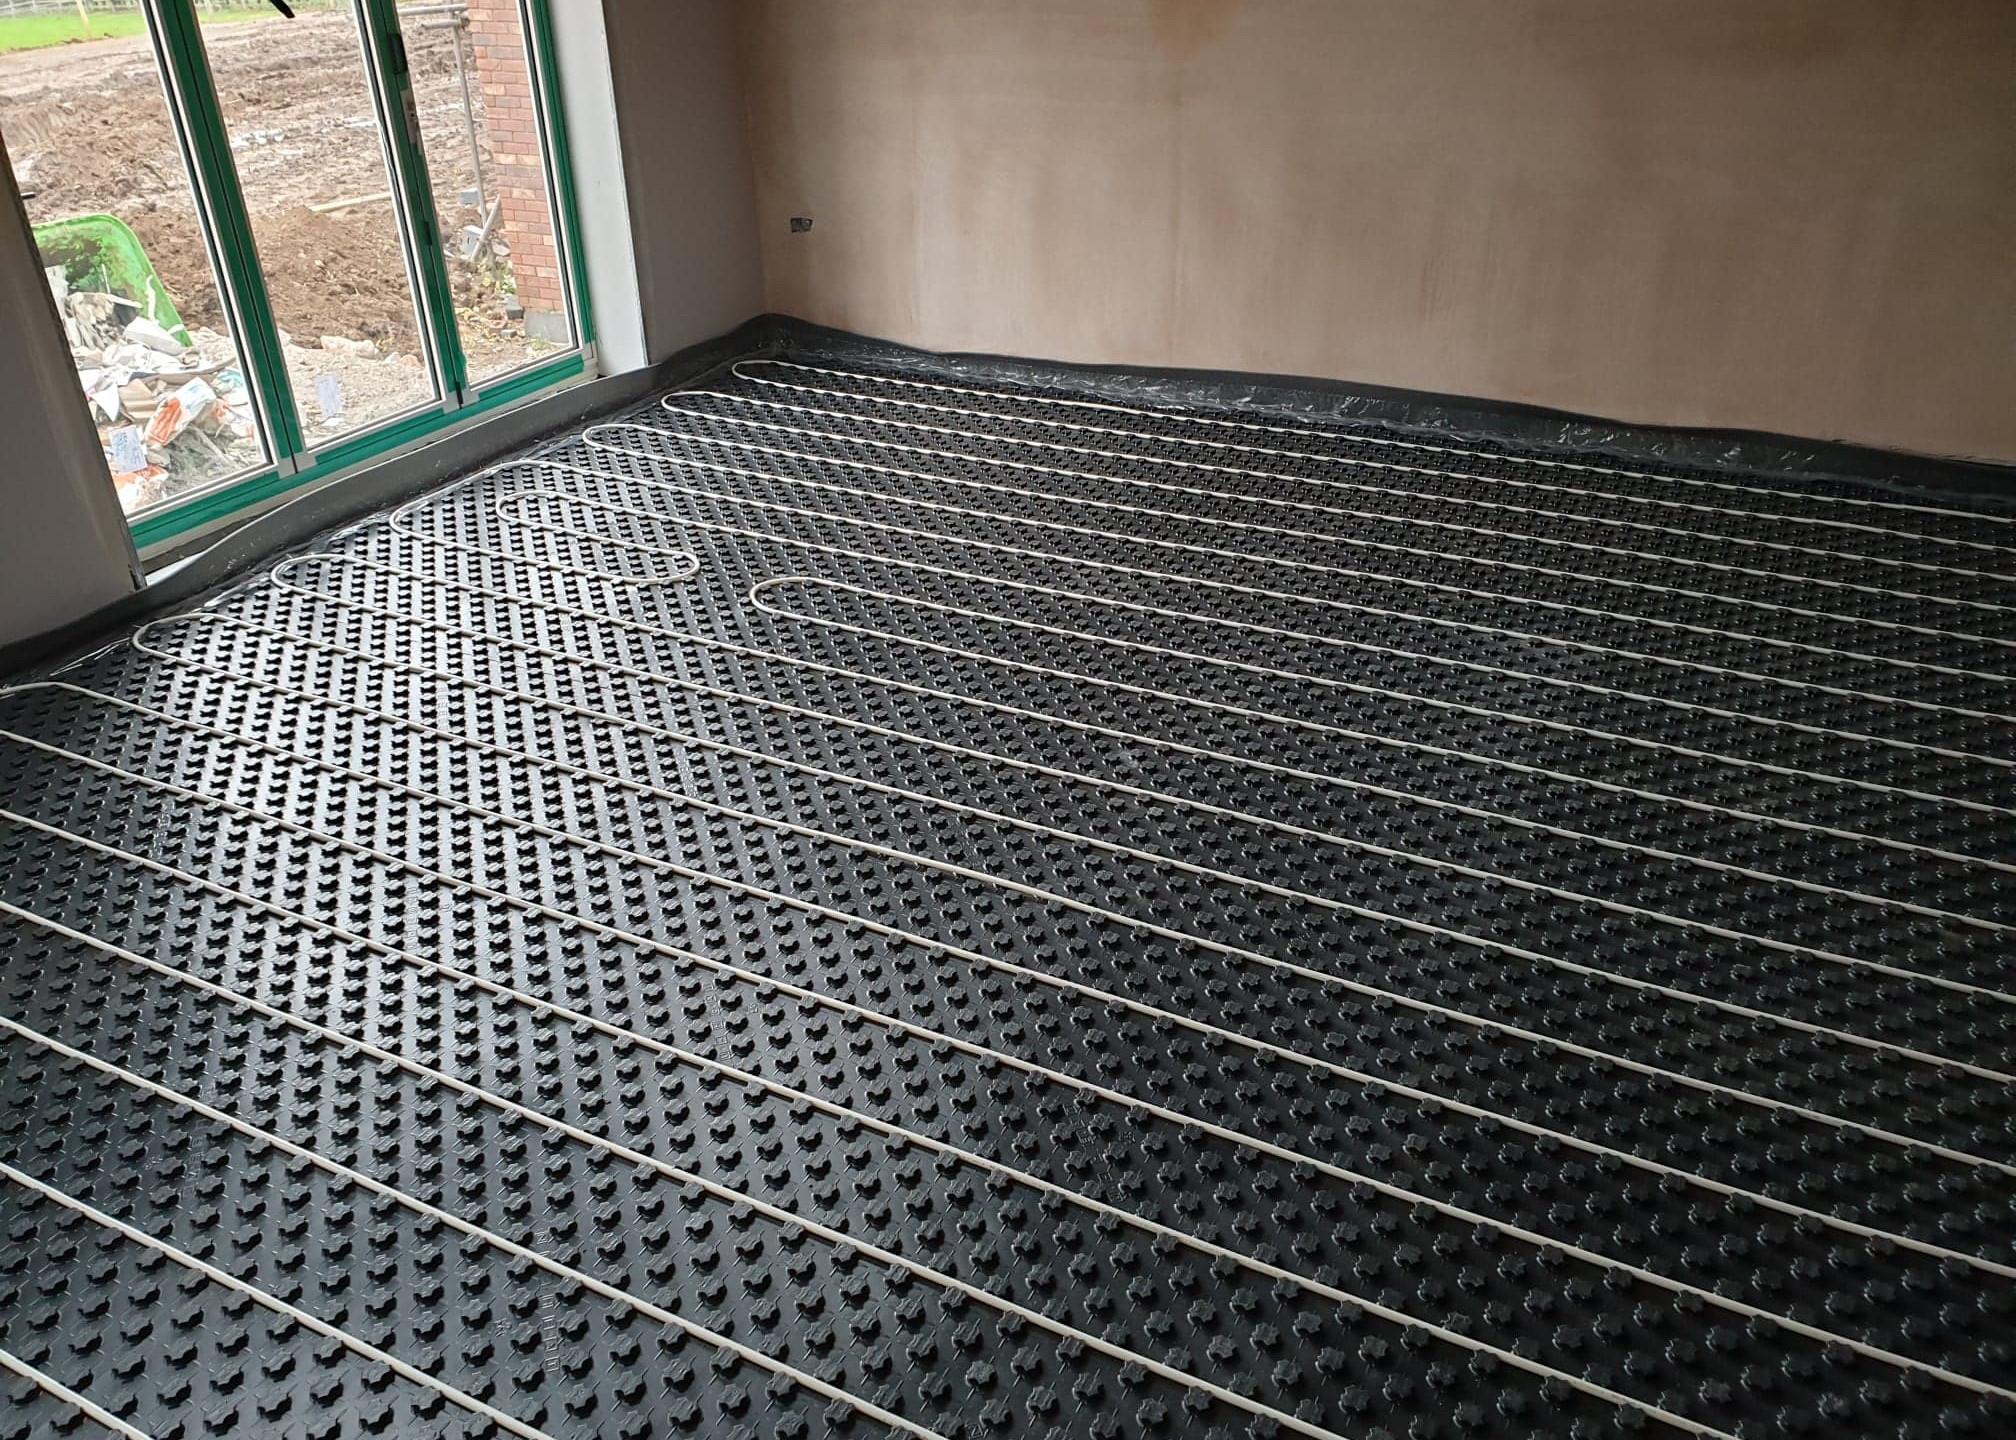 New underfloor heating in new build Shropshire home